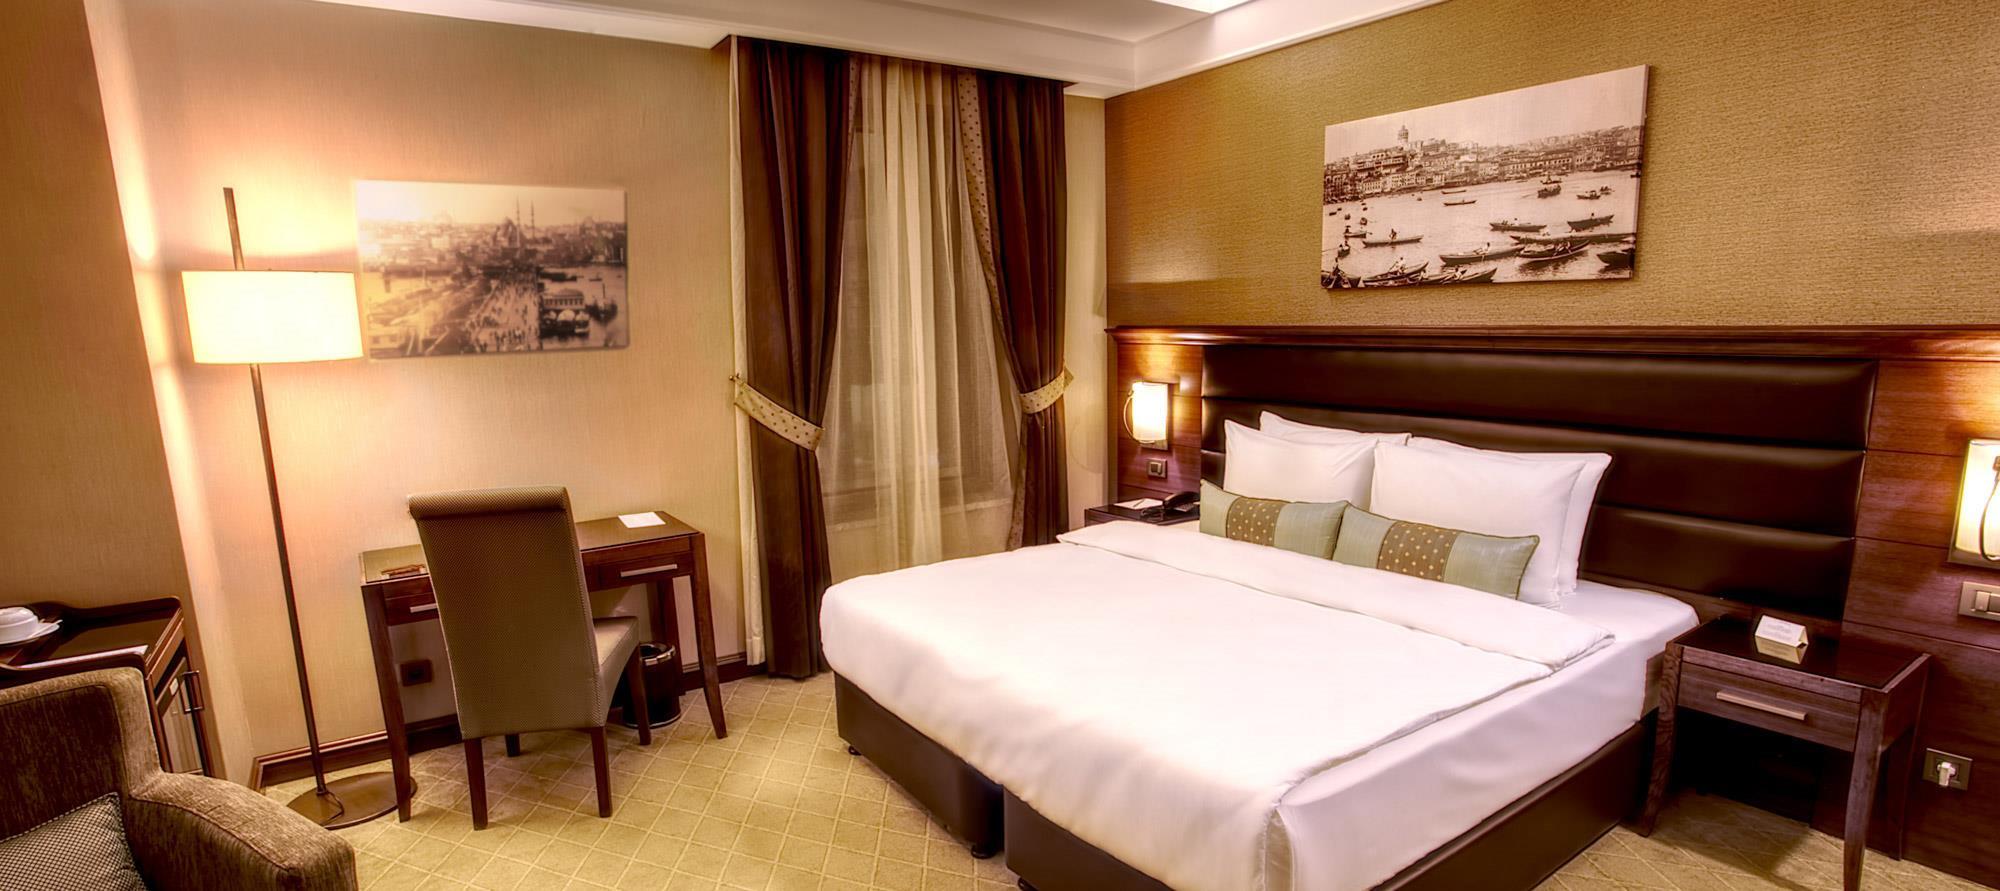 Grand Makel Hotel Topkapi254598